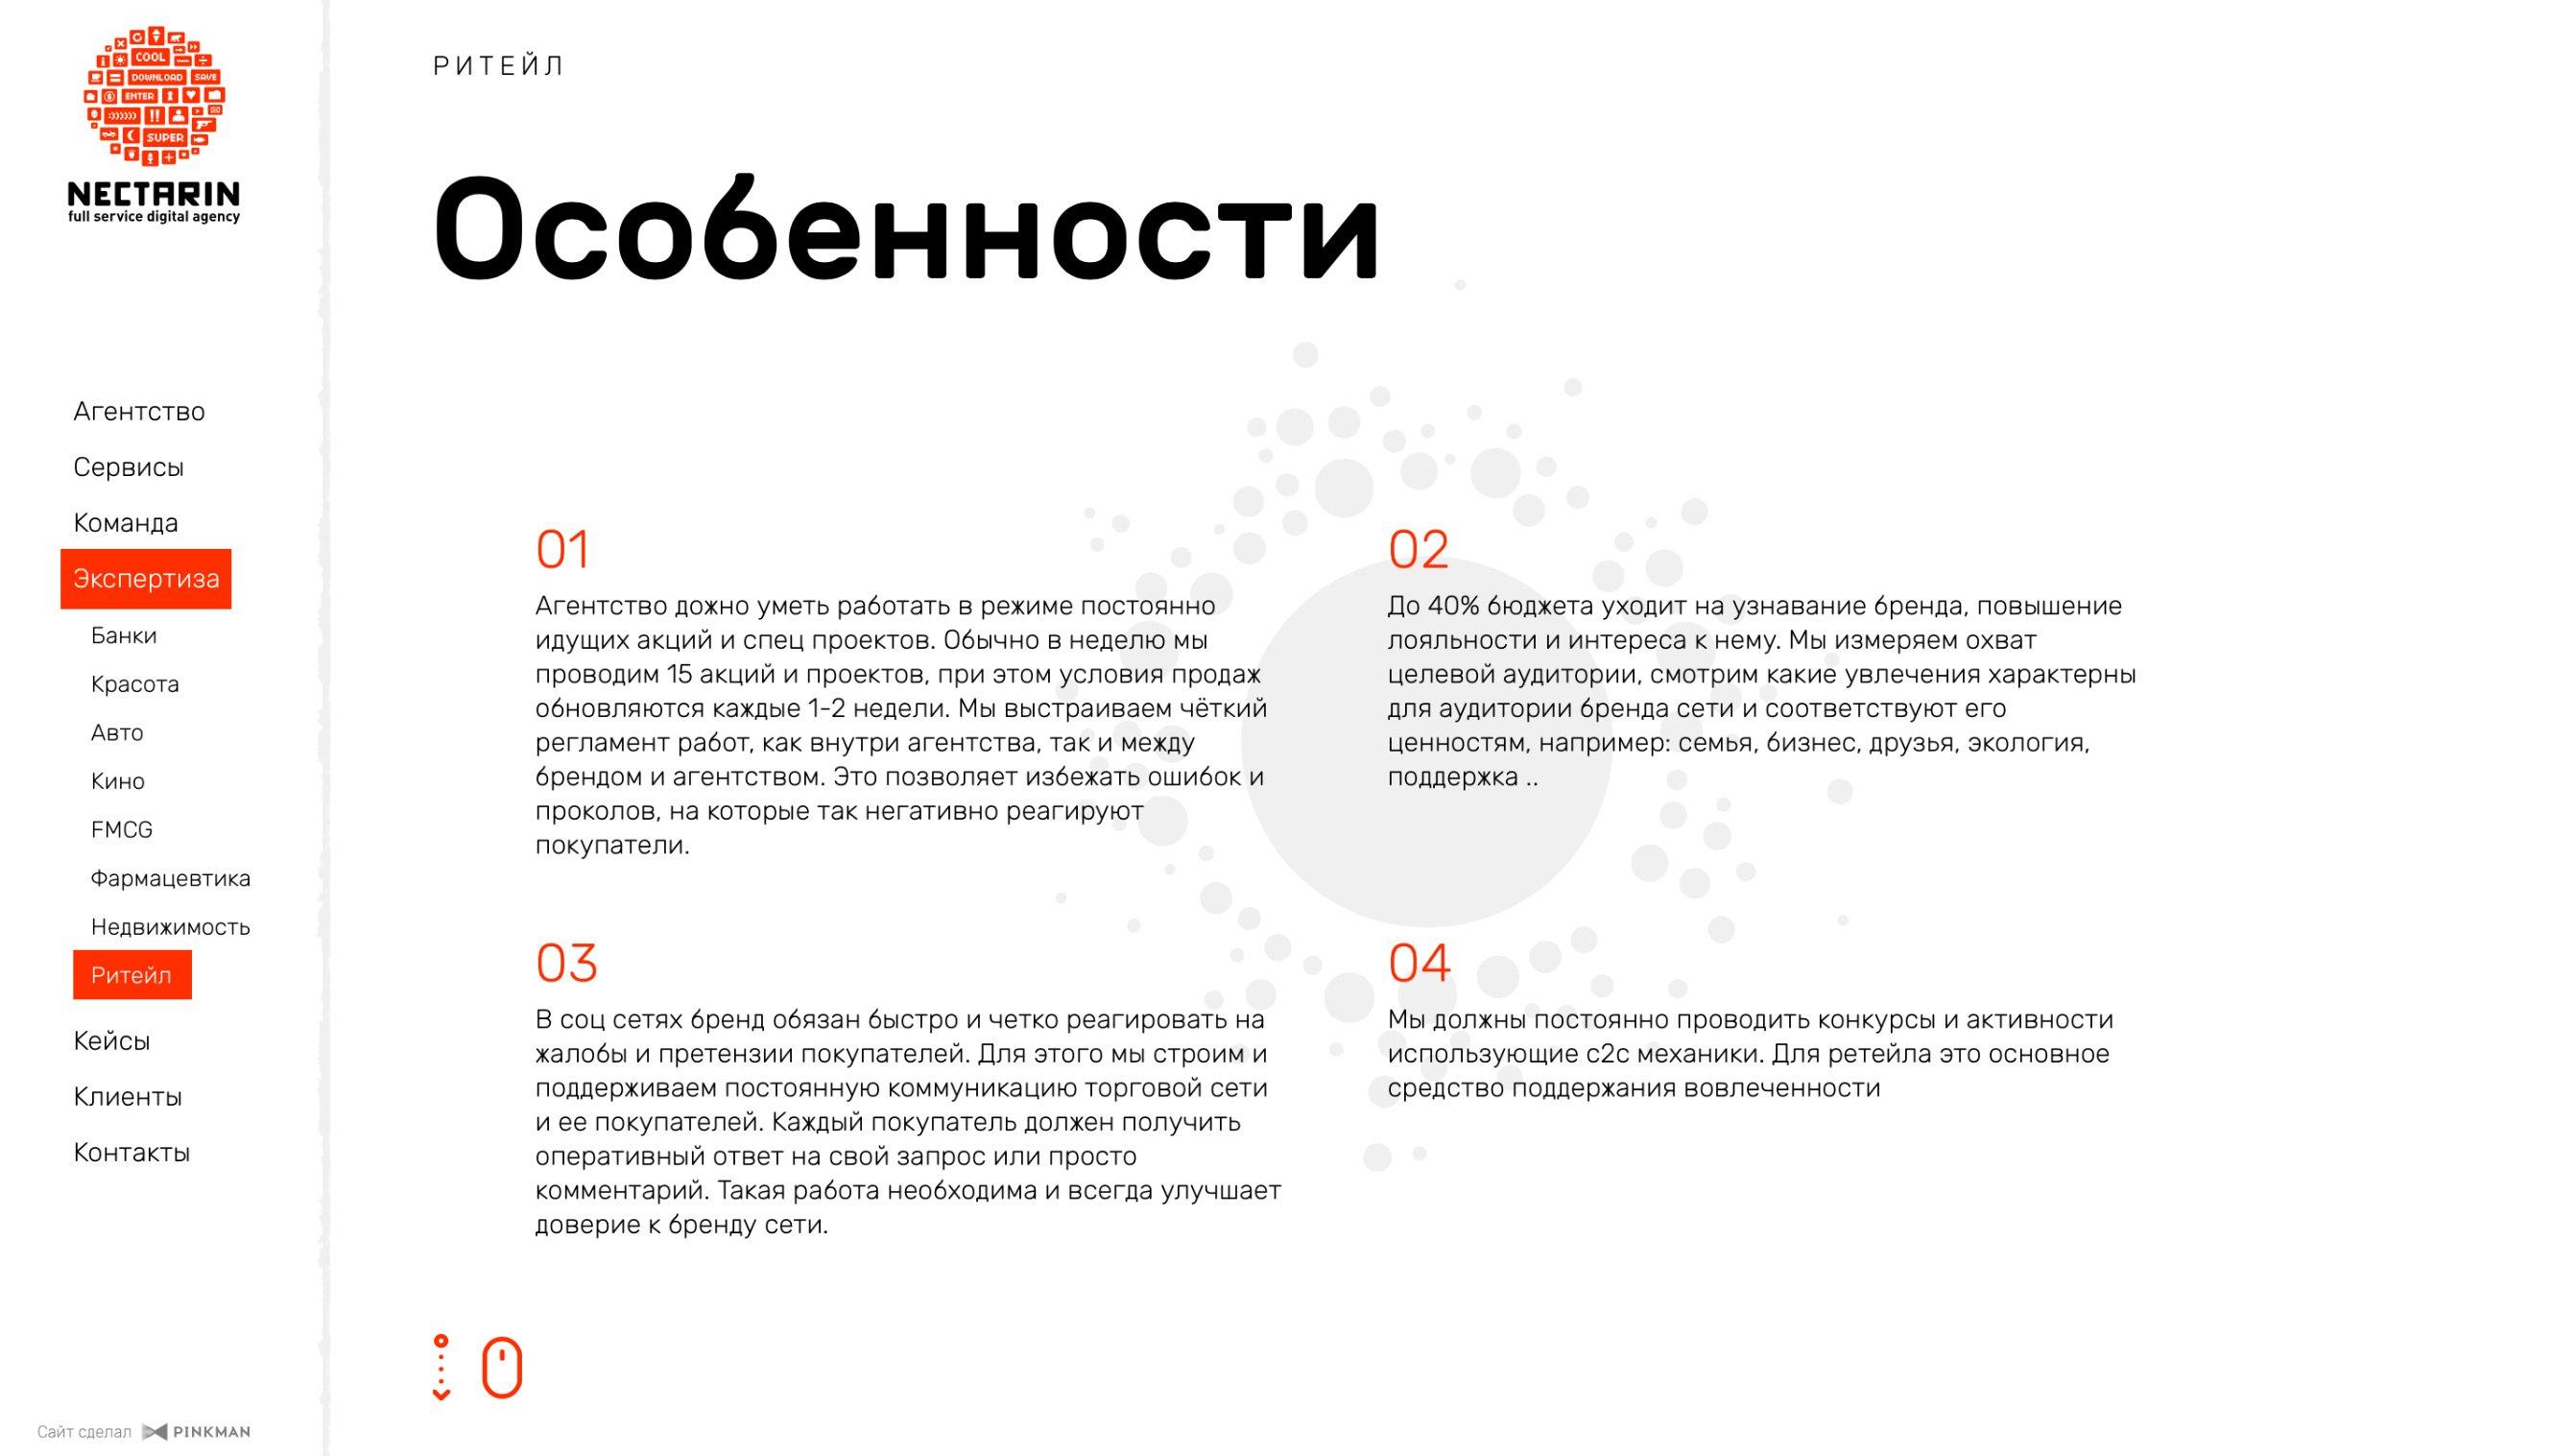 Сайт агентства Nectarin